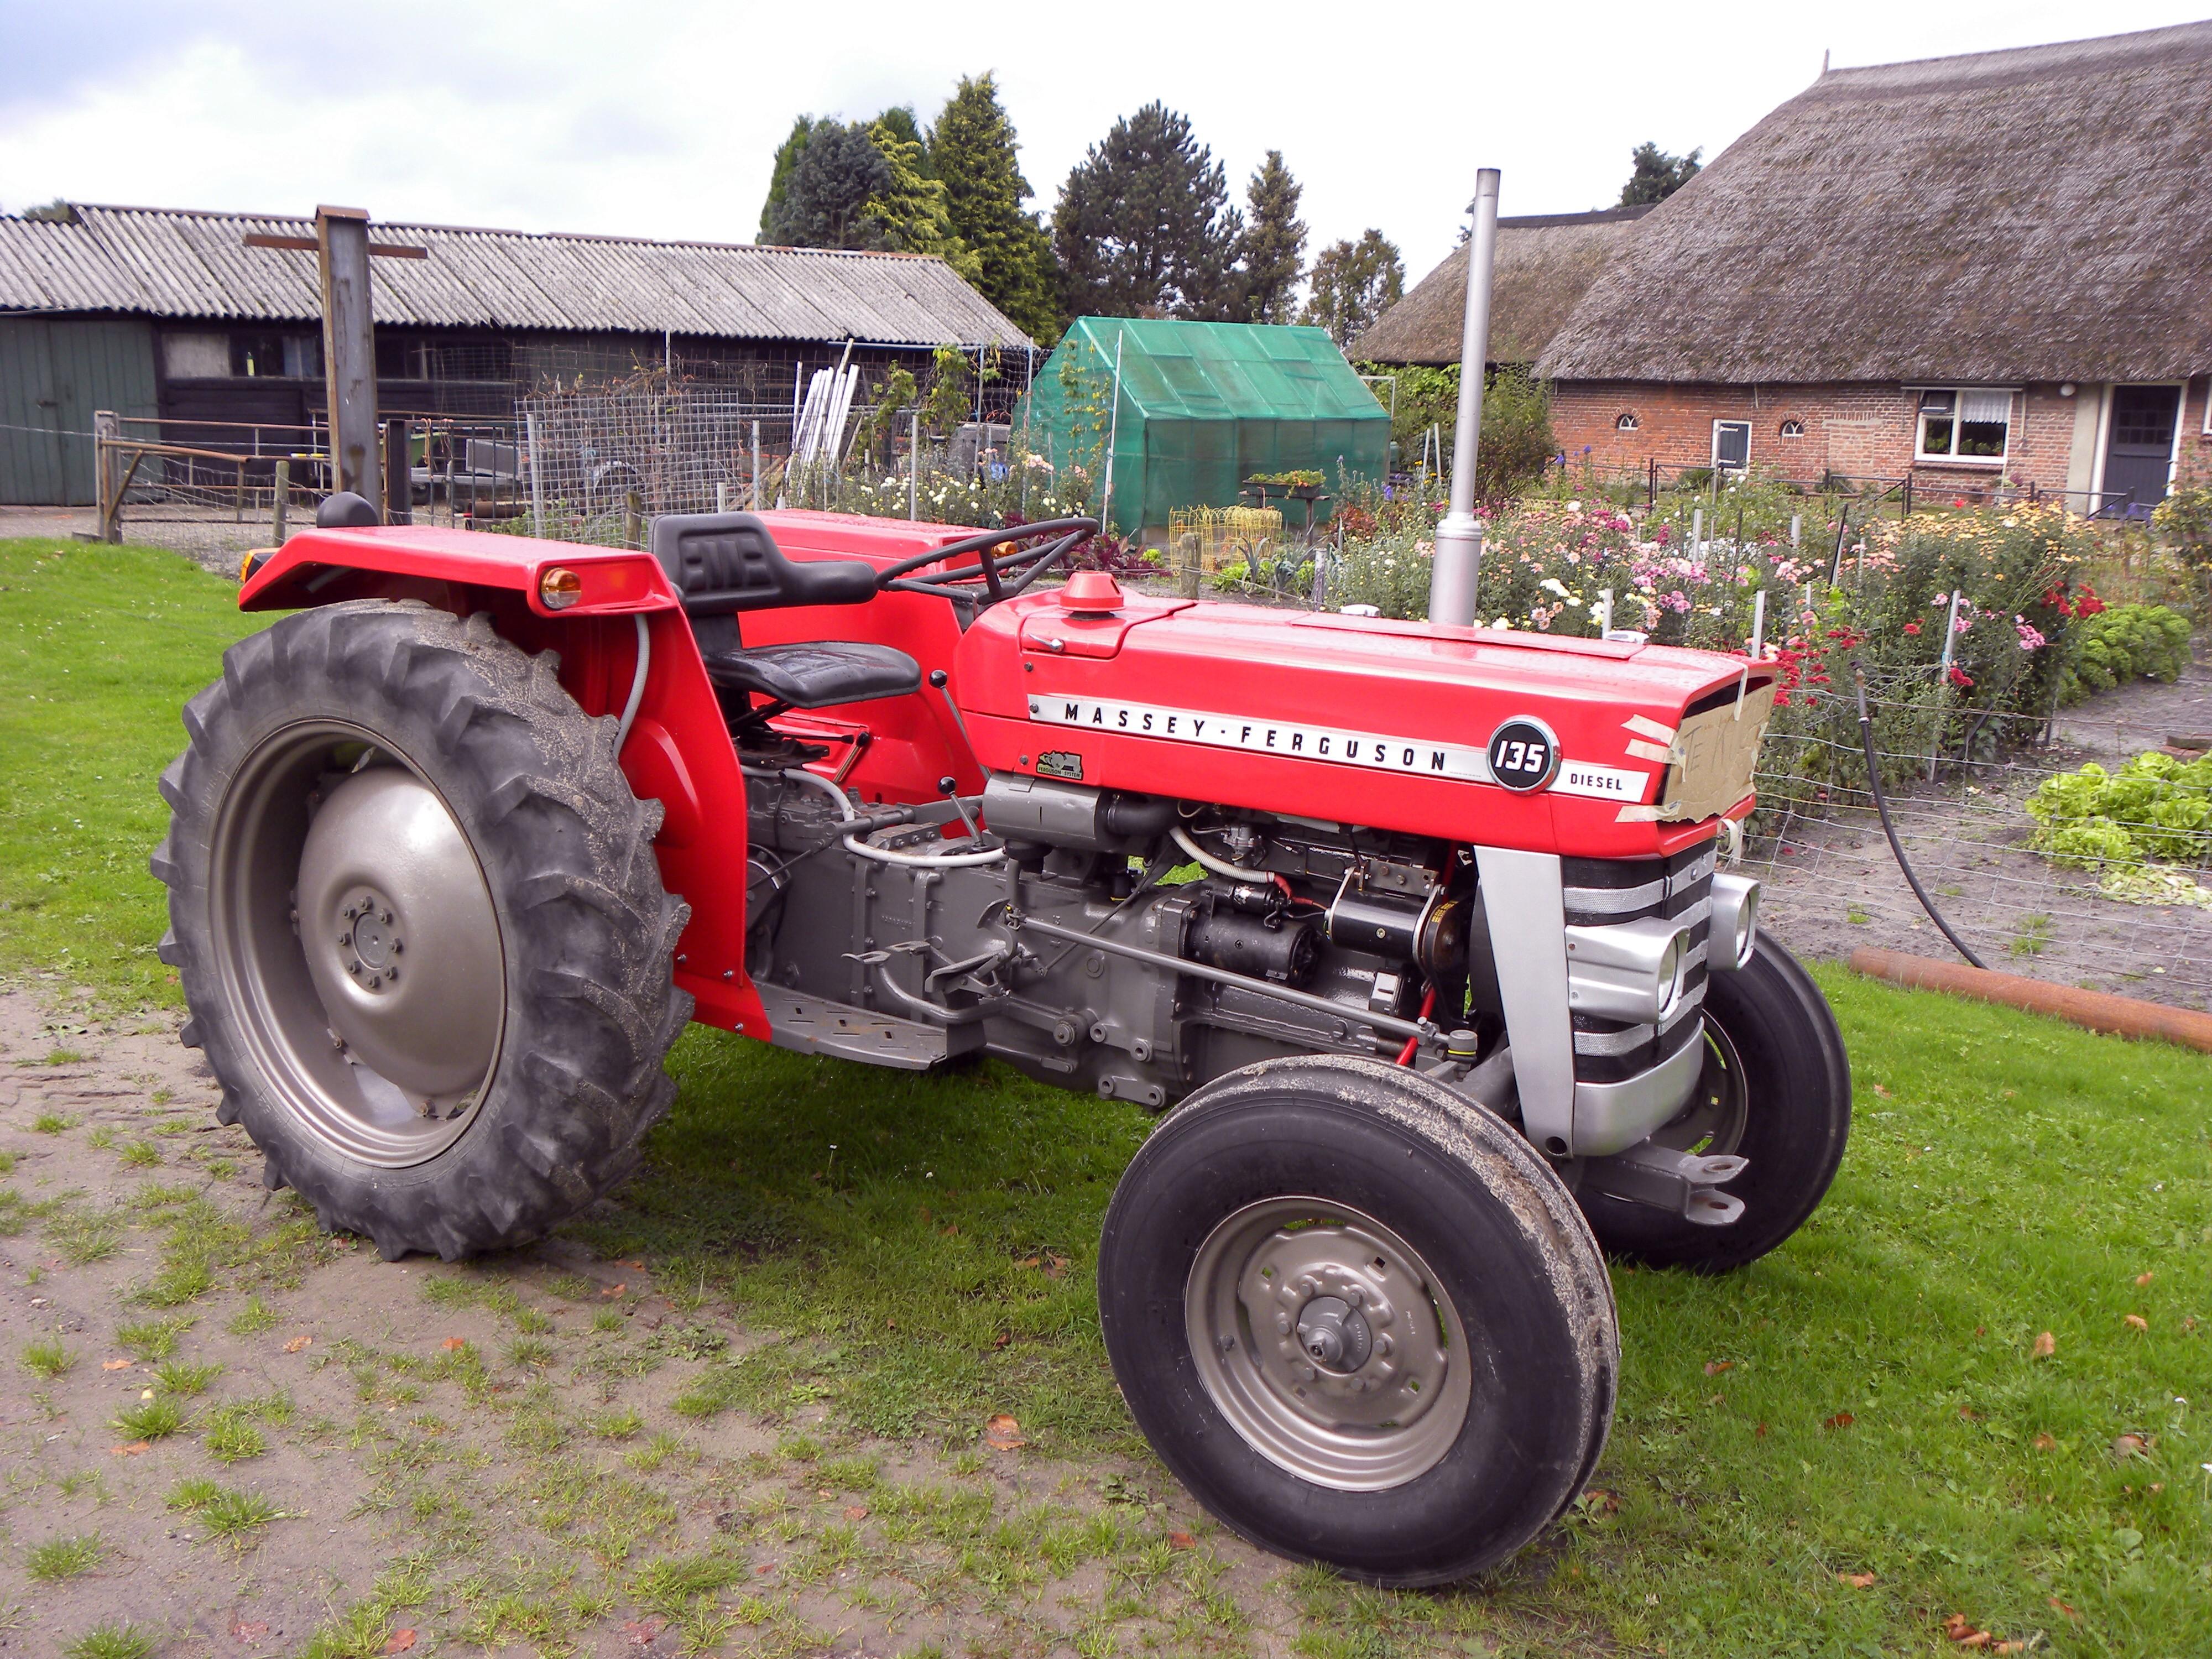 Massey Ferguson 142 Farm Tractor | Massey Ferguson Farm Tractors